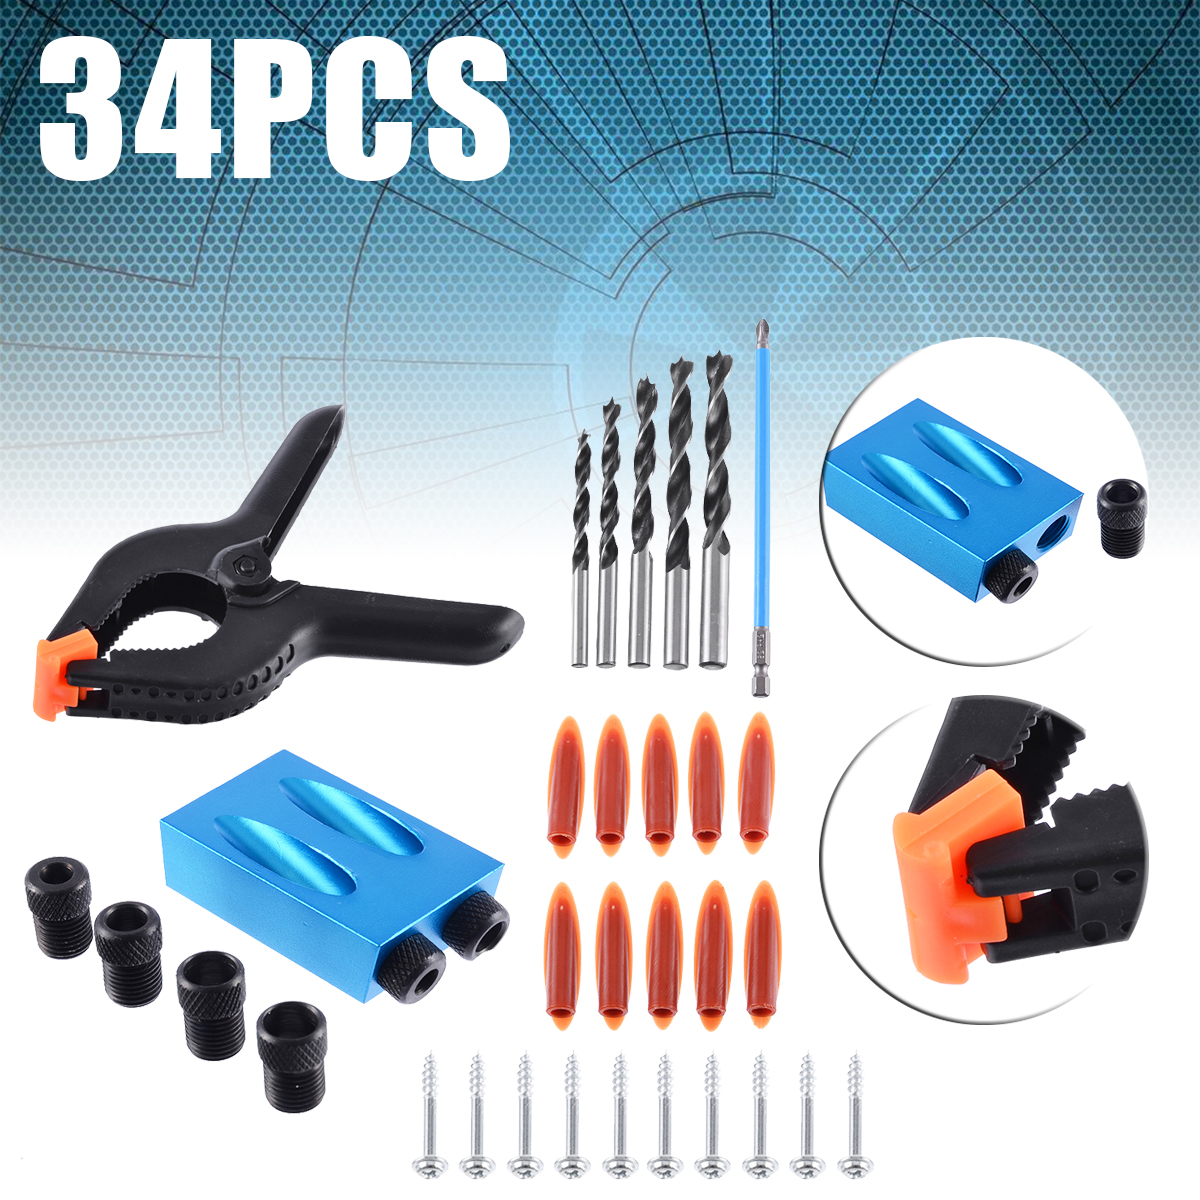 34pcs/set 6-10mm Drill Bit Set for Pocket Hole Jig Woodworking Clamps Pocket Screws PH2 150mm Magnetic Screwdriver Tool